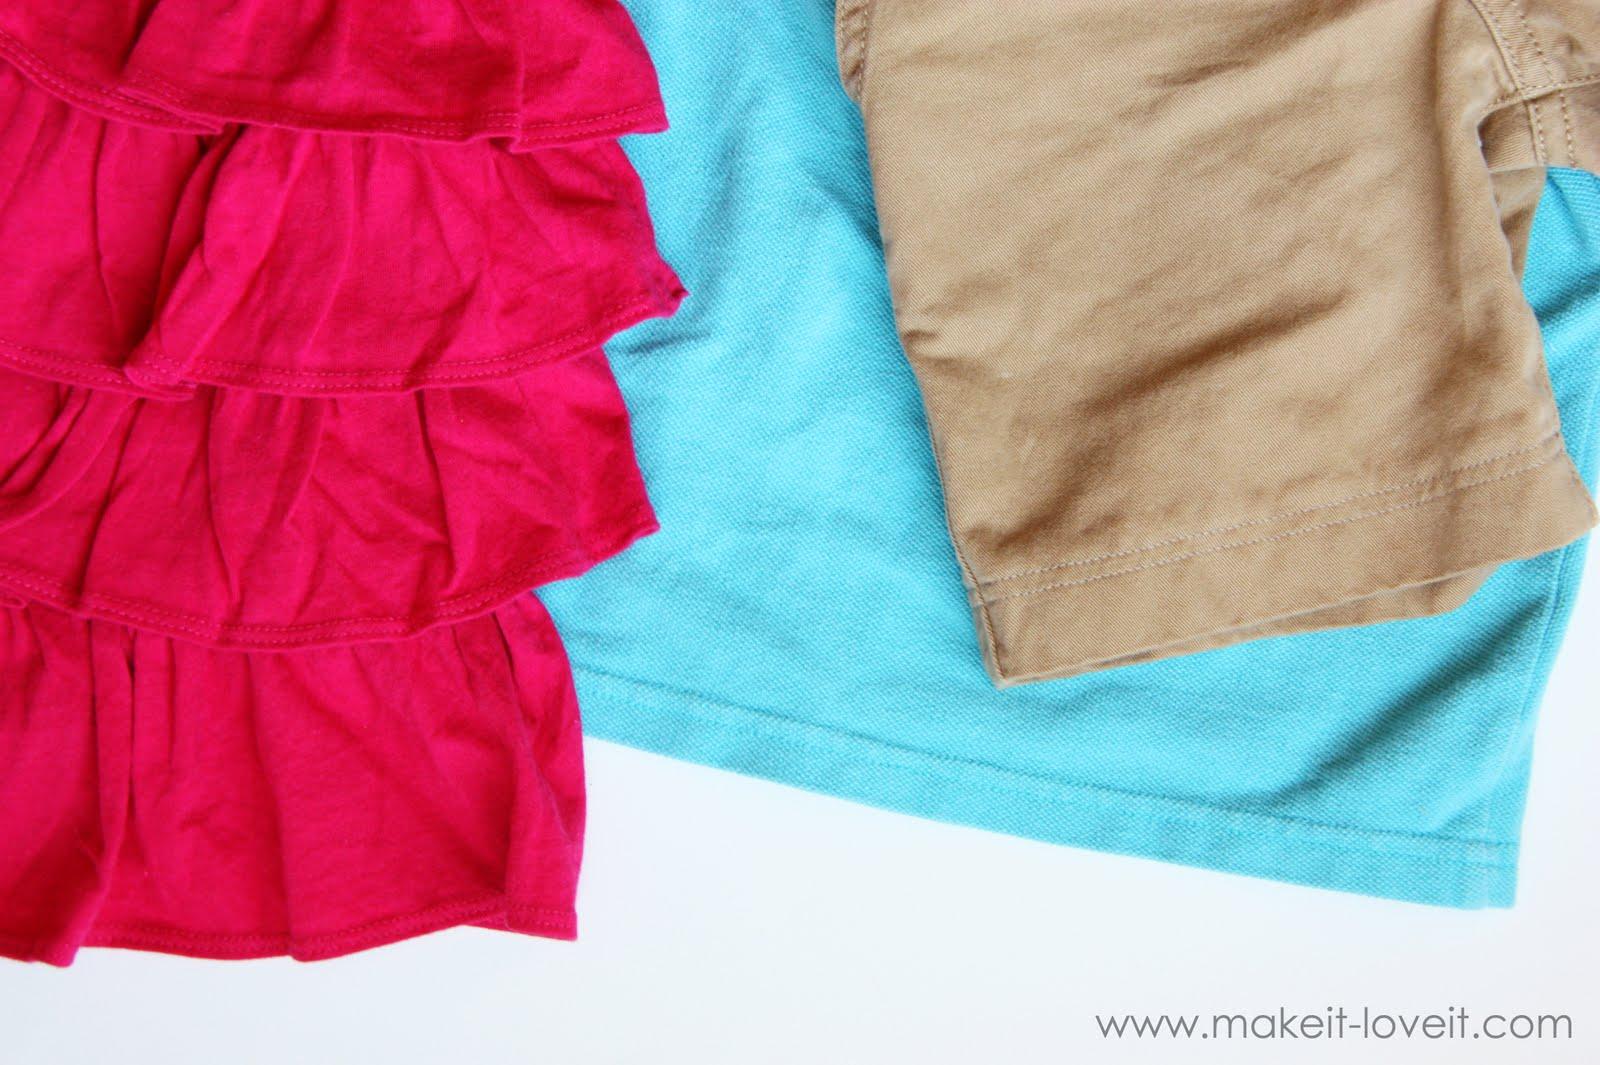 Sewing Tips: Basic Stitches (plus the Double Needle) – Make